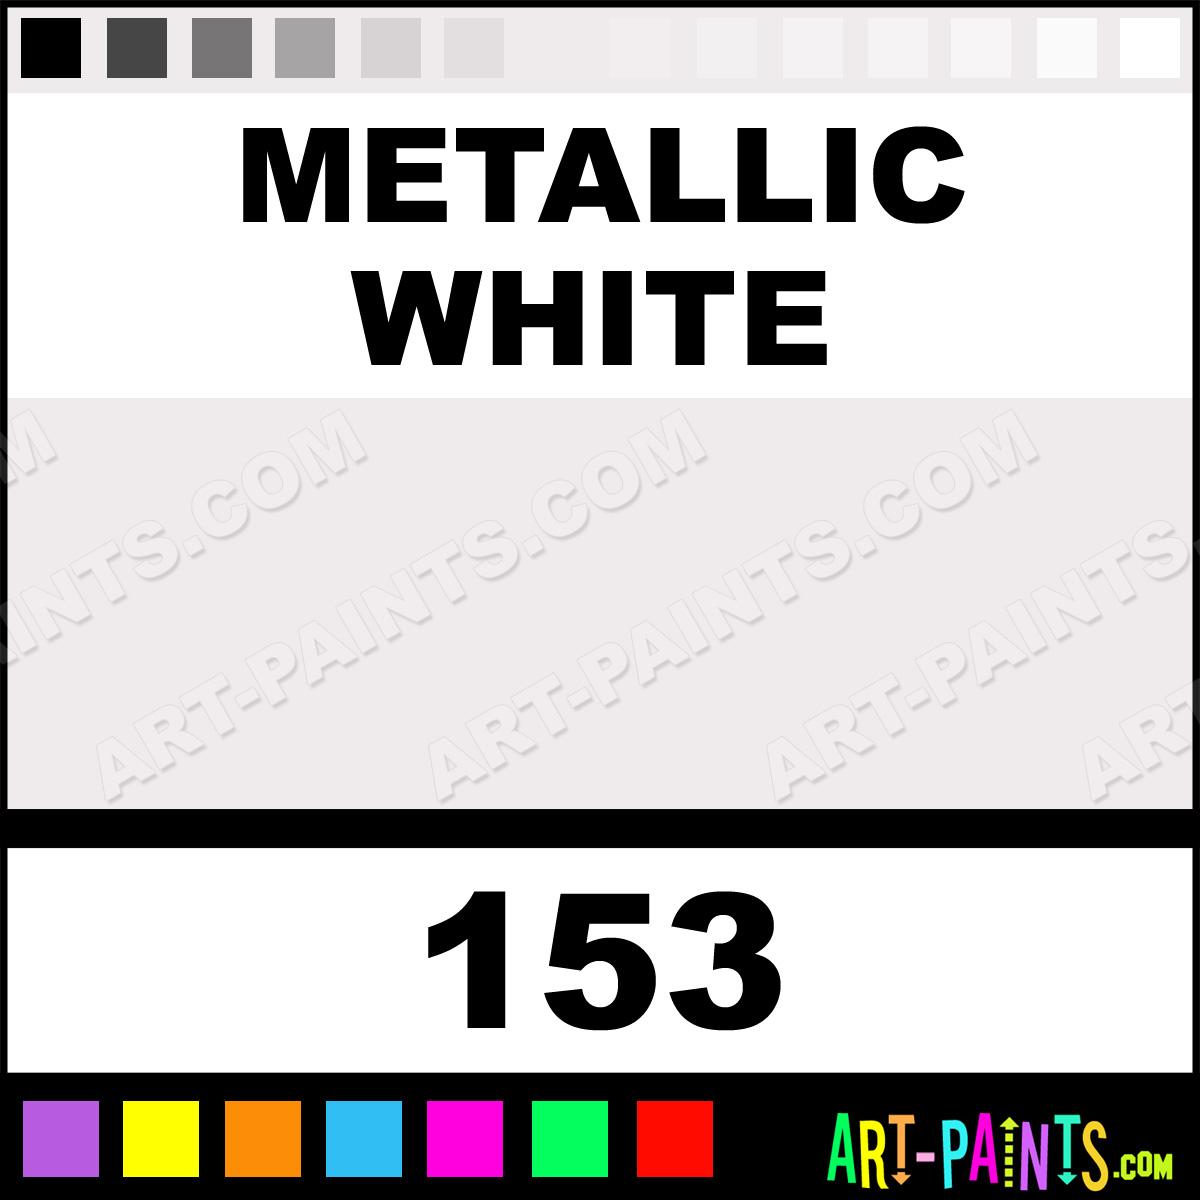 Metallic White Metallic Airbrush Spray Paints 153 Metallic White Paint Metallic White Color